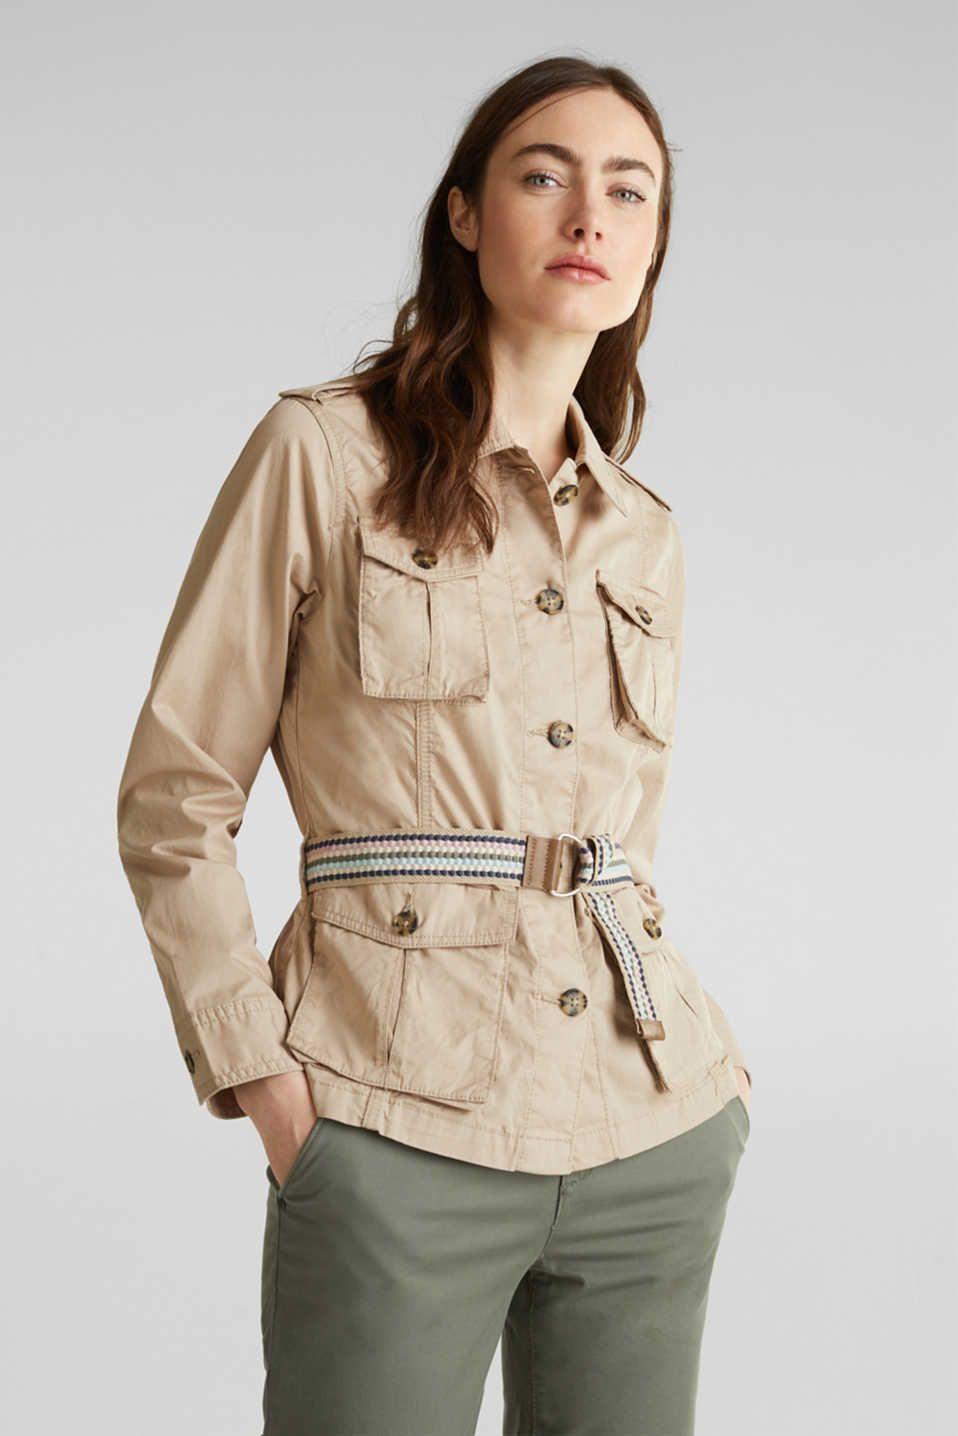 Esprit Utility Jacket With A Belt 100 Organic Cotton At Our Online Shop Utility Jacket Jackets Organic Cotton [ 1436 x 958 Pixel ]